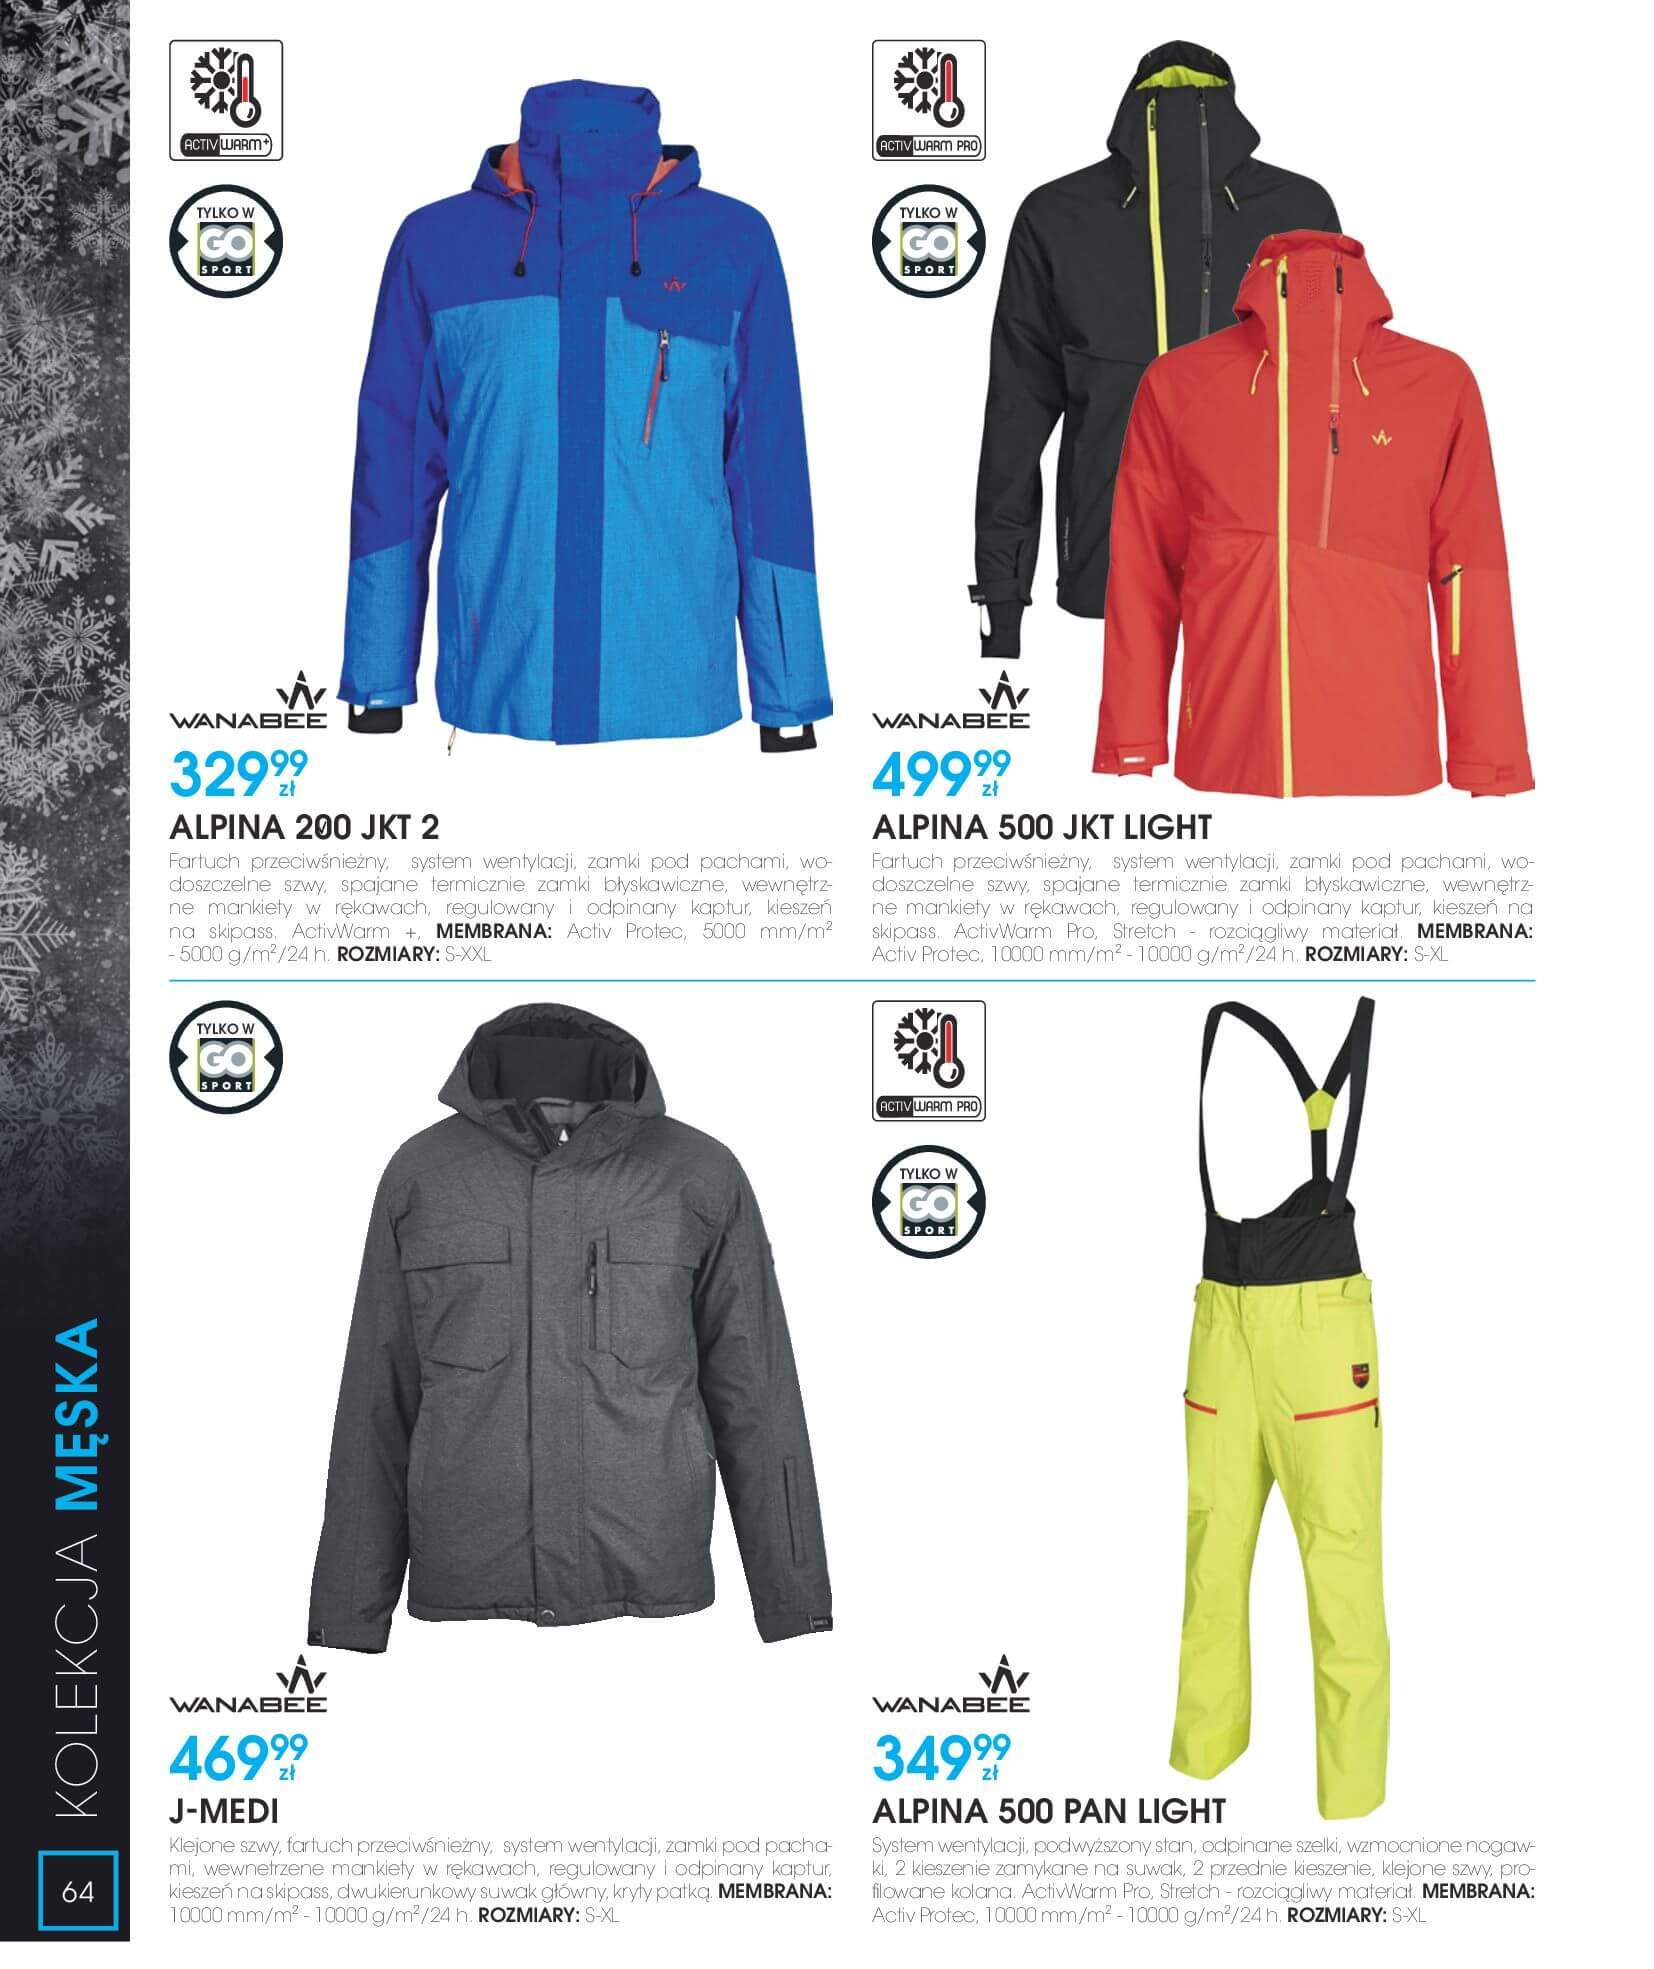 Gazetka Go Sport - Katalog Zima 2017/2018-12.11.2017-28.02.2018-page-64